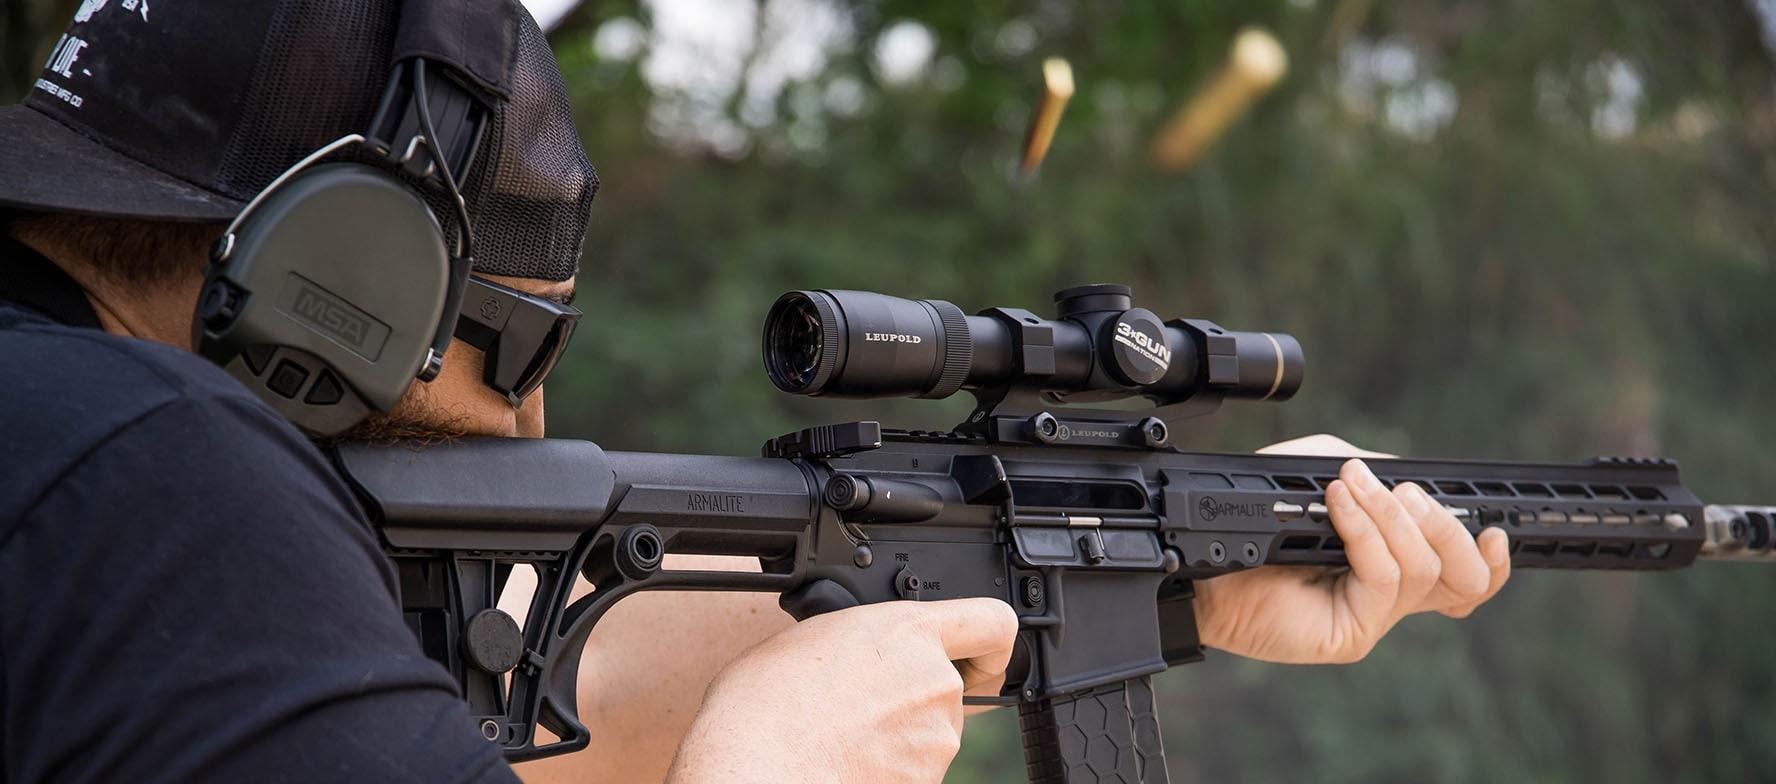 Armalite semi auto rifle